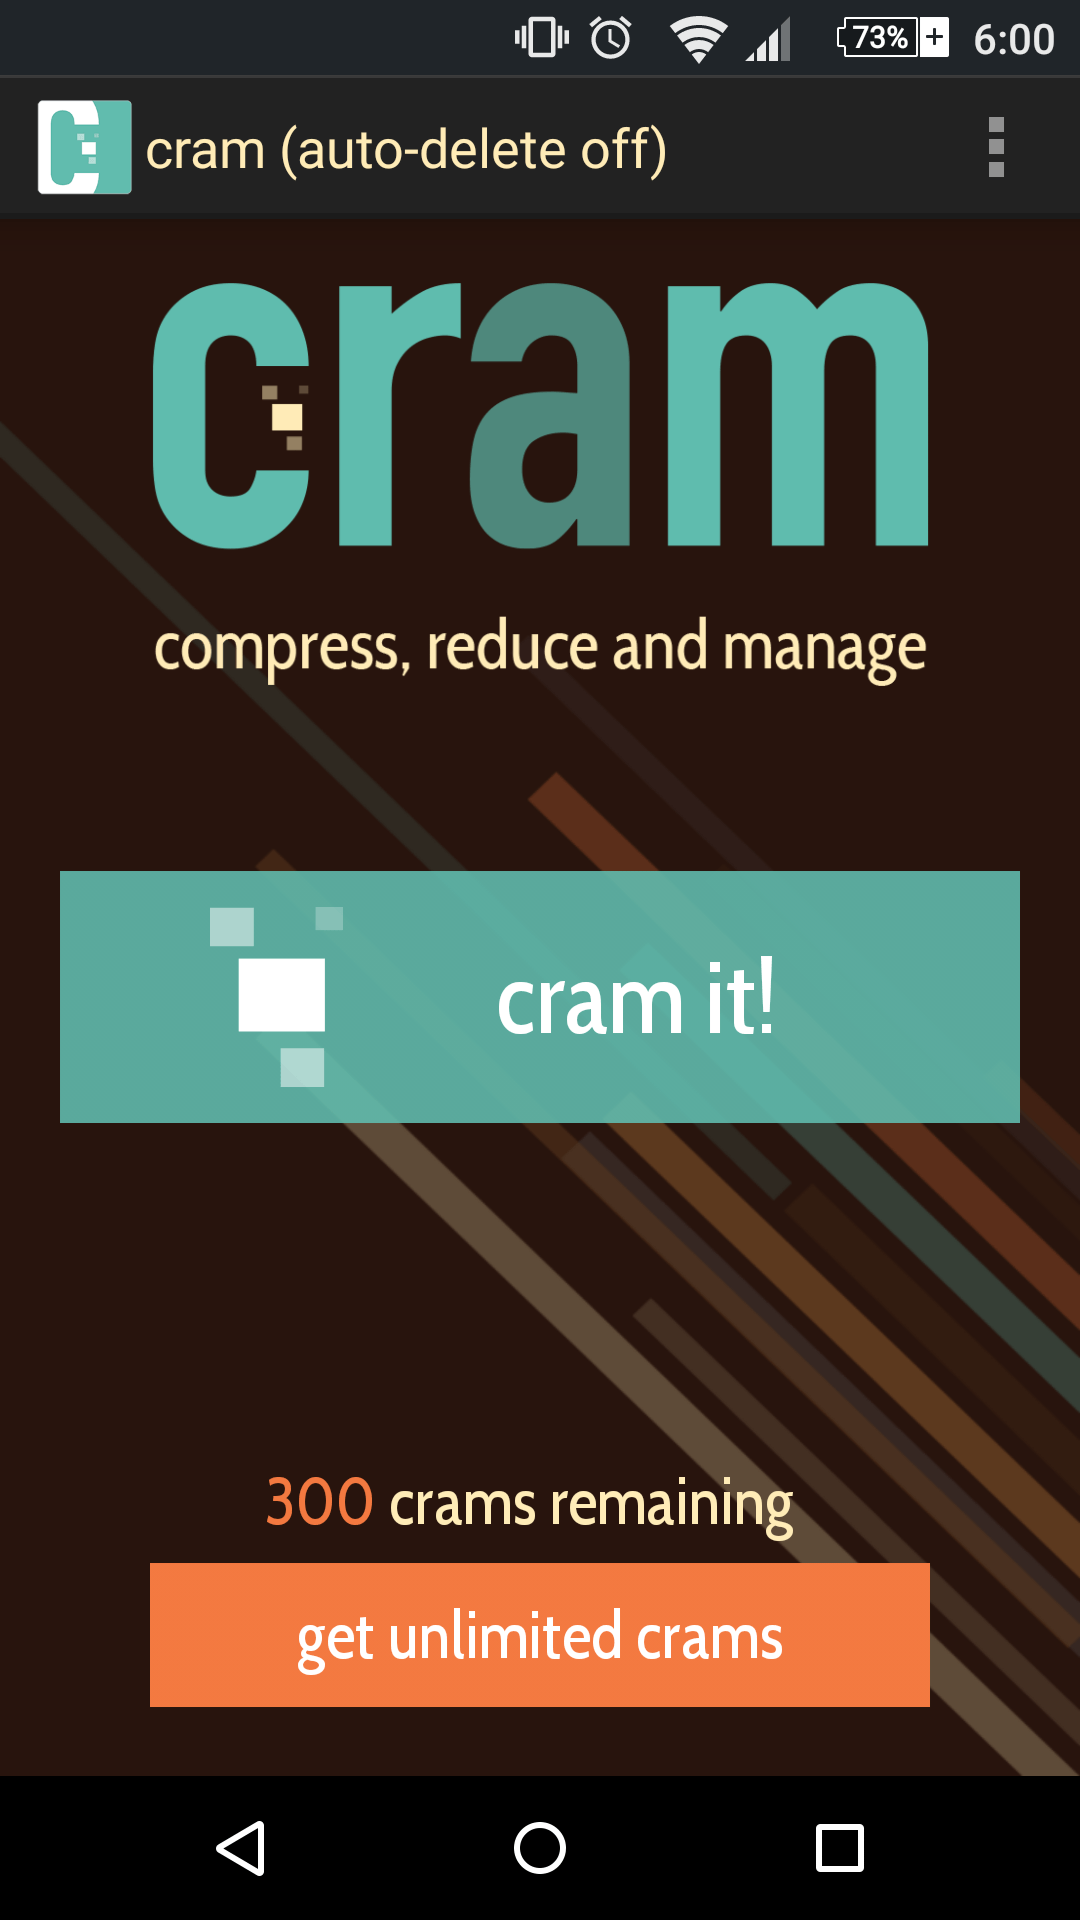 Cram image compressor